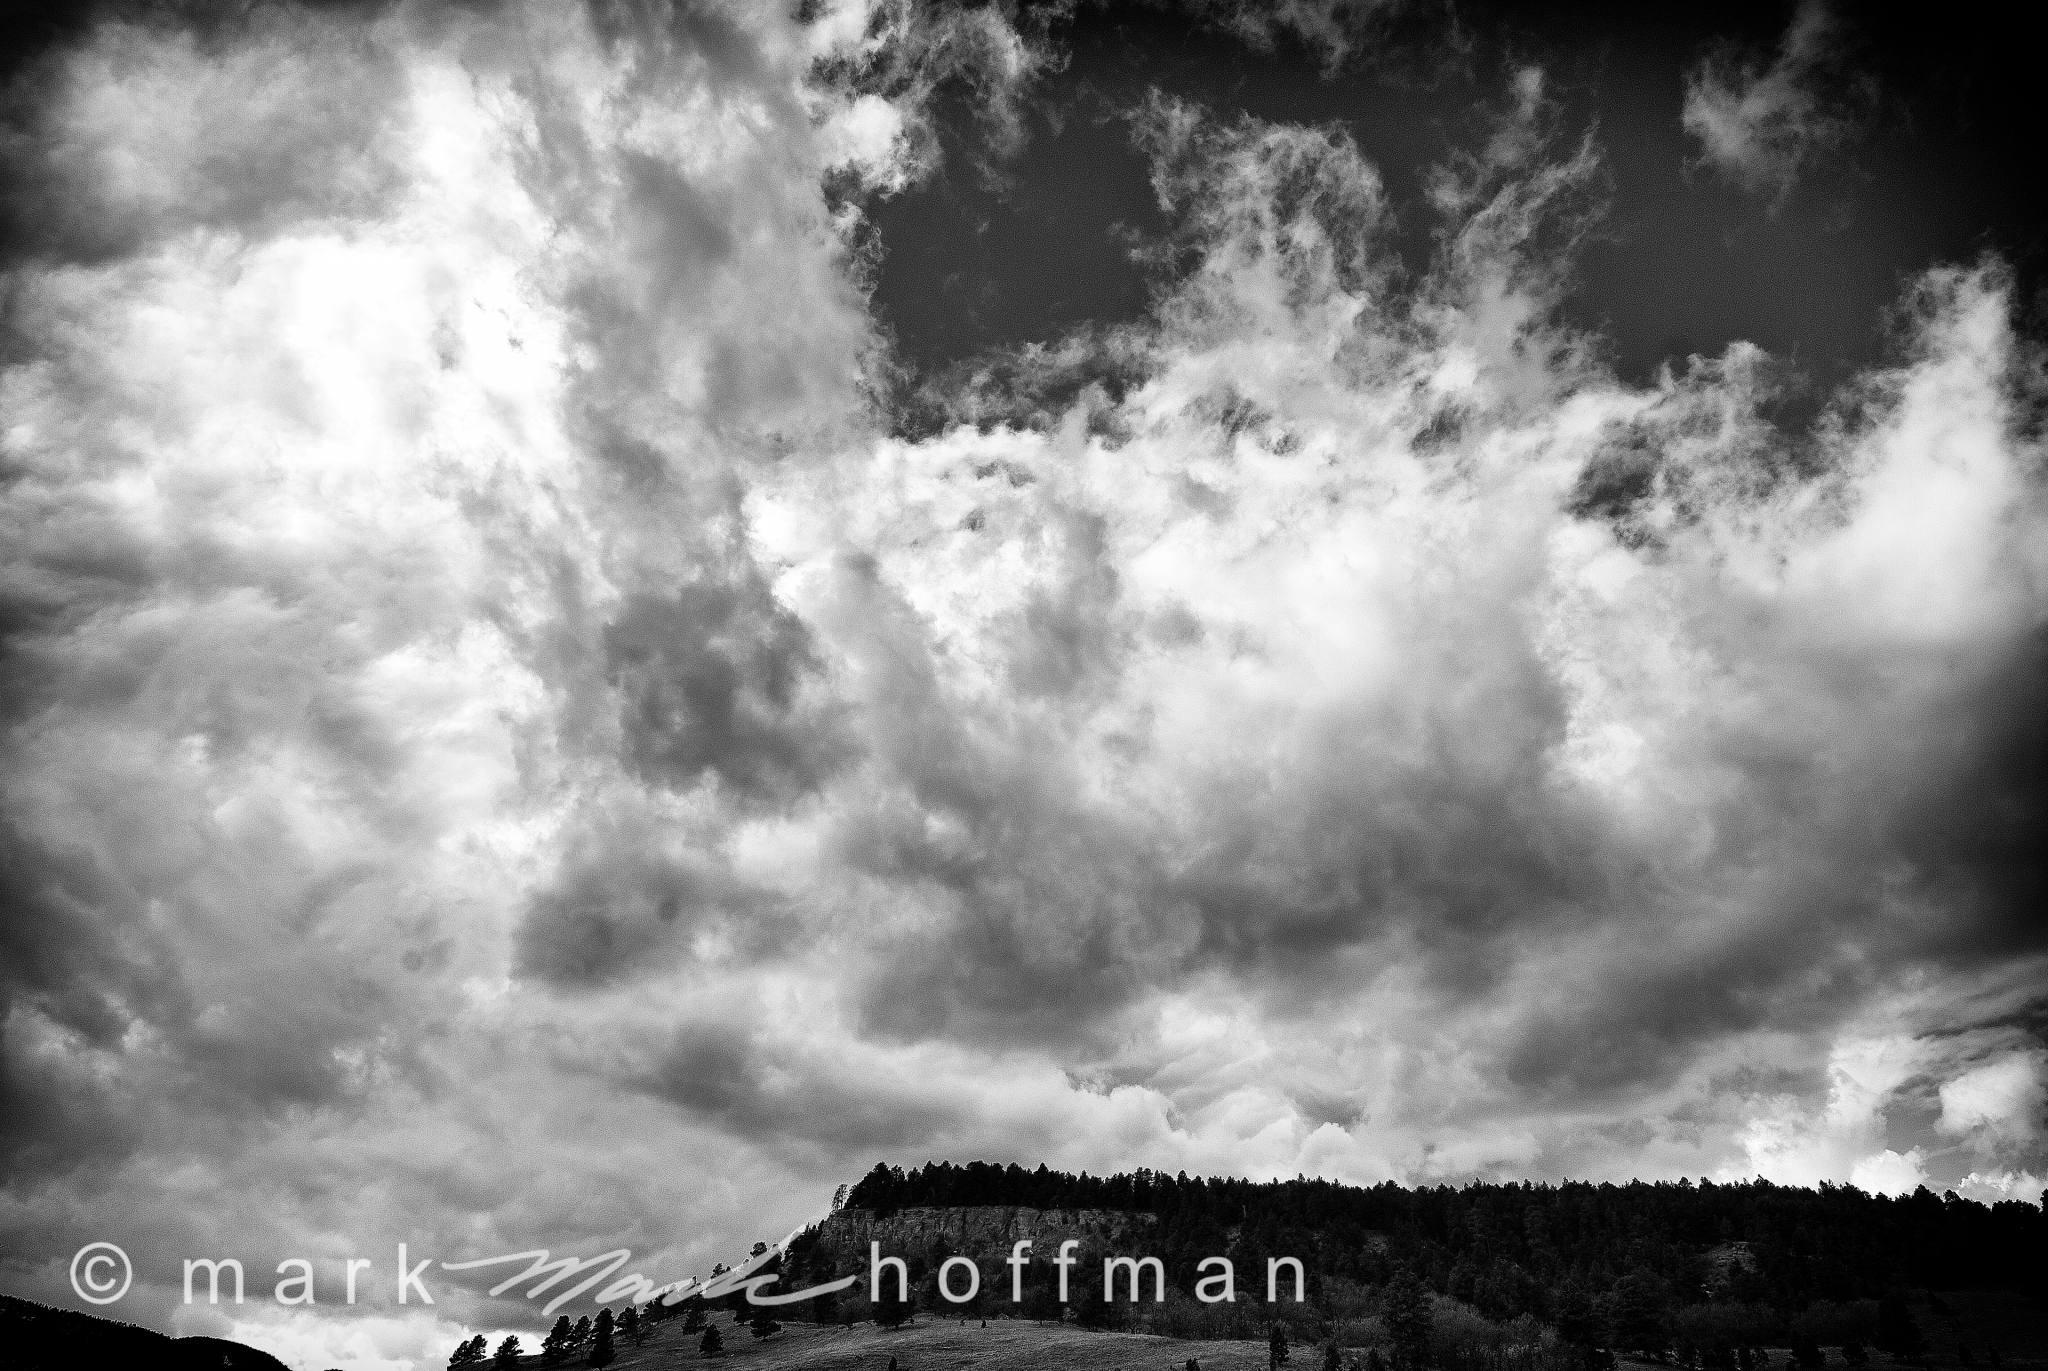 Mark_Hoffman_ND25830_Edit_cap1_var1.jpg